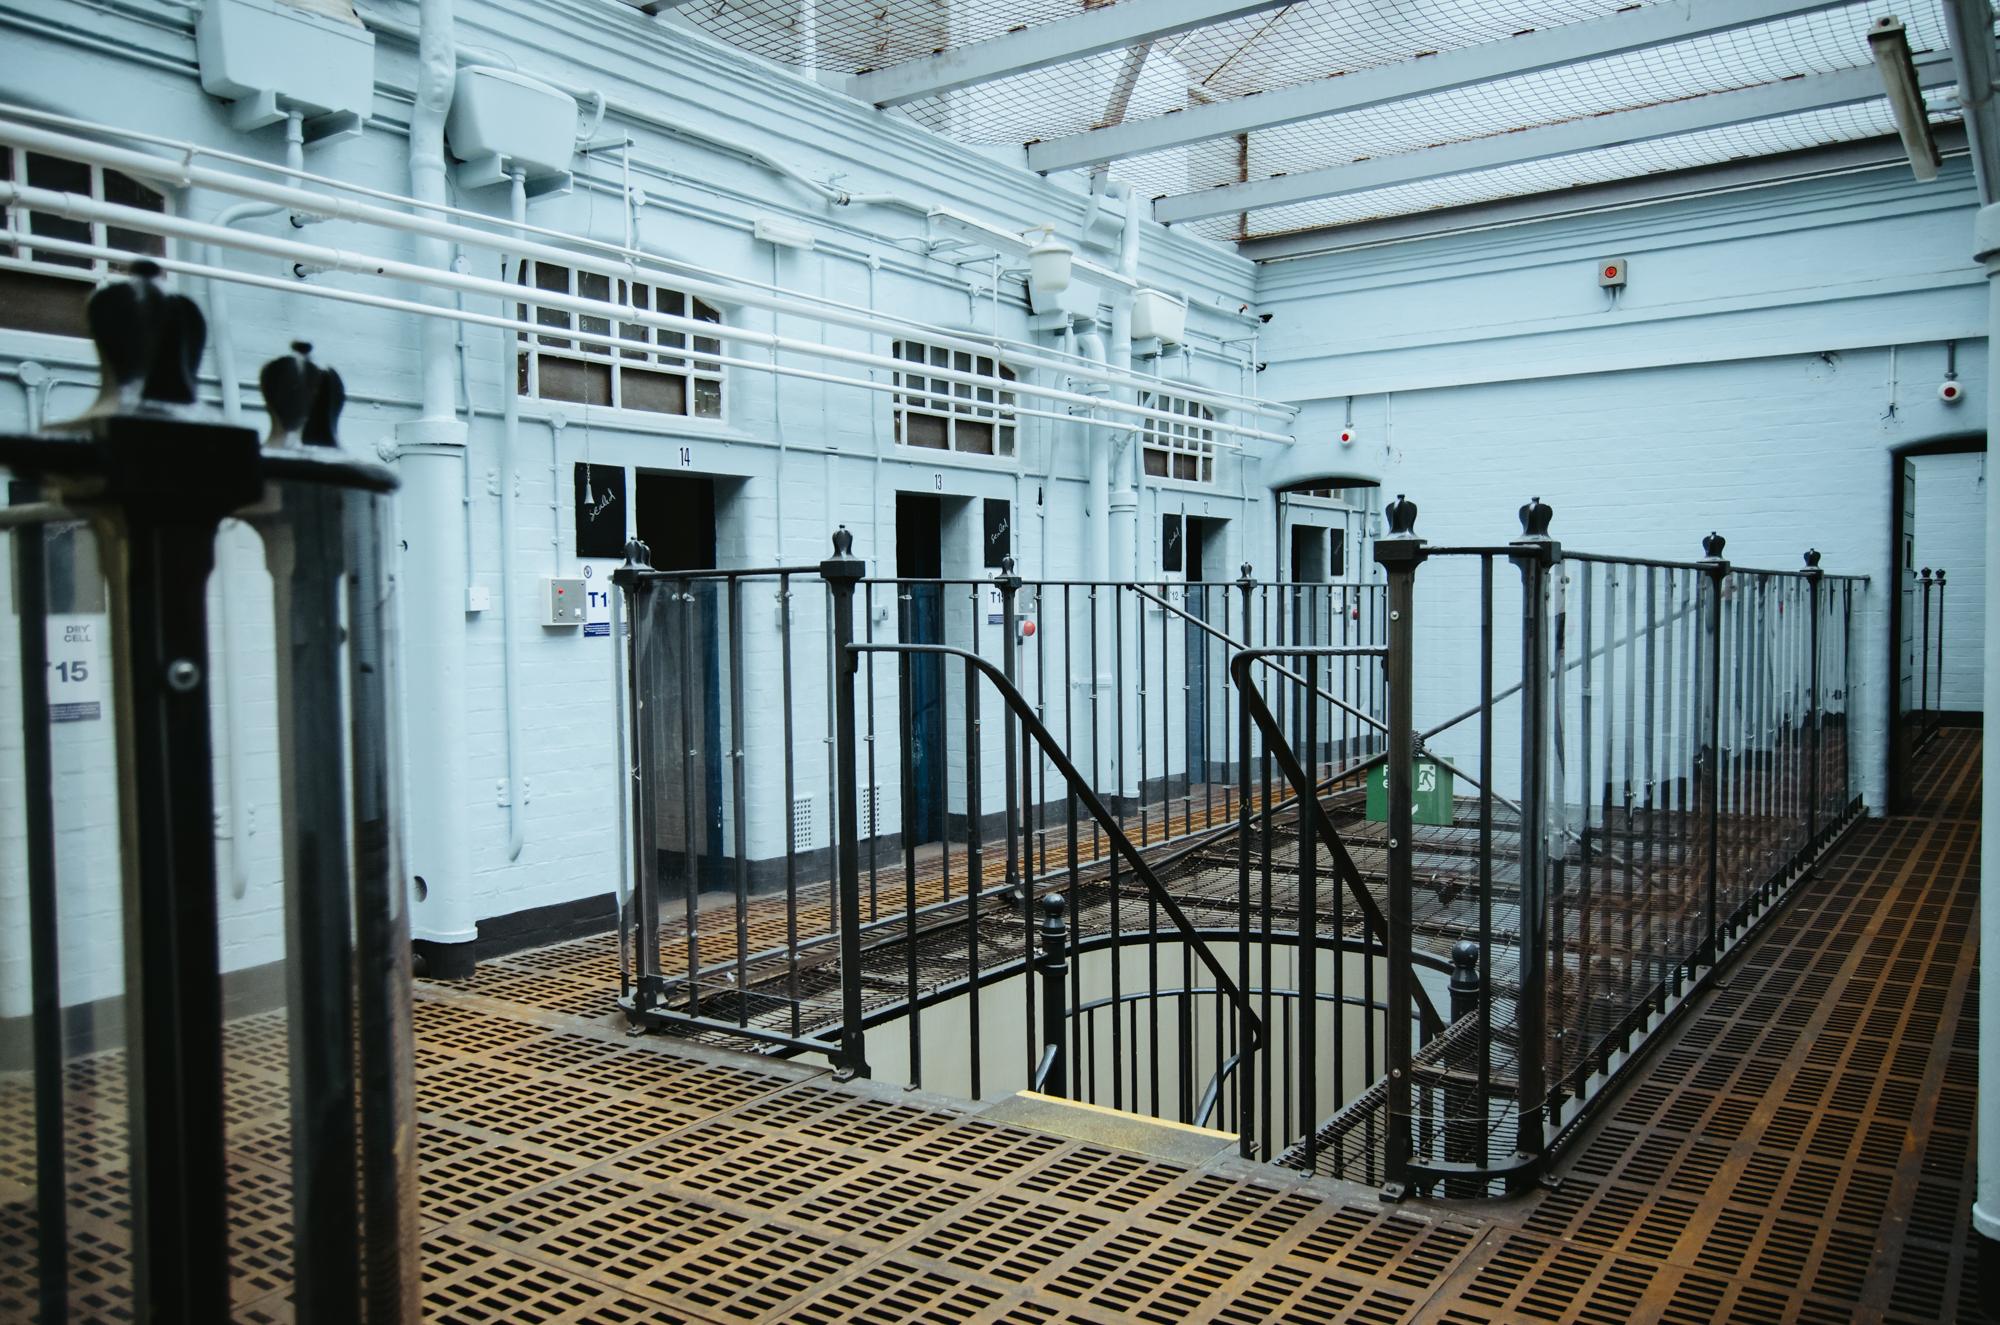 Steelhouse-Lane-Lock-Up-Birmingham-Hanny-Foxhall-_DSC2541.jpg